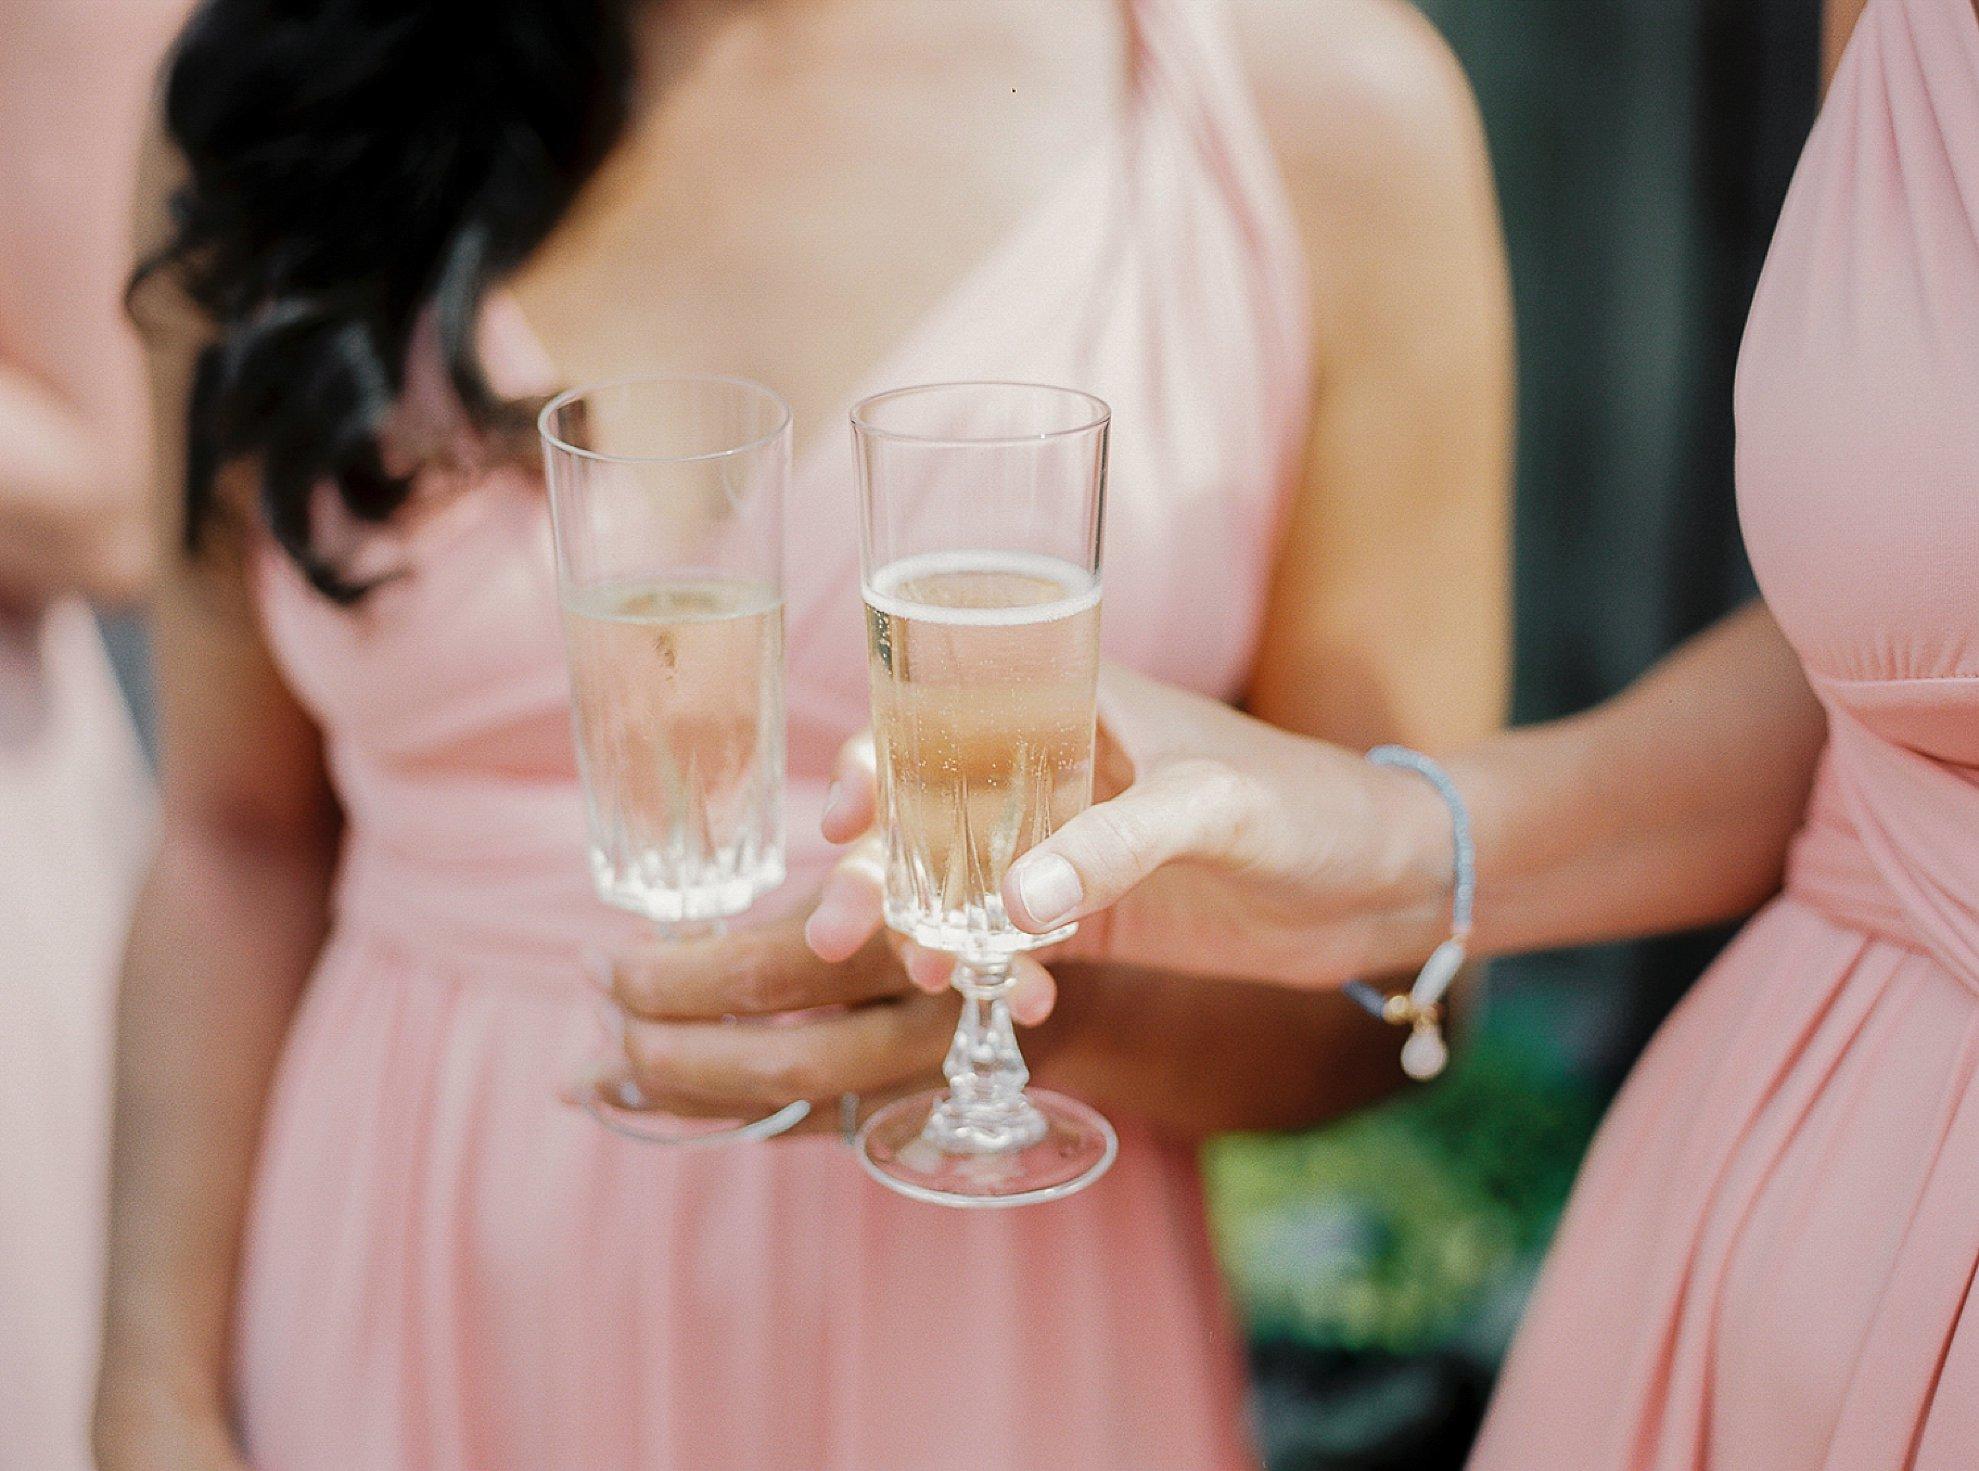 Amanda-Drost-Fotografie-Belgie-Photography-Wedding_0031.jpg